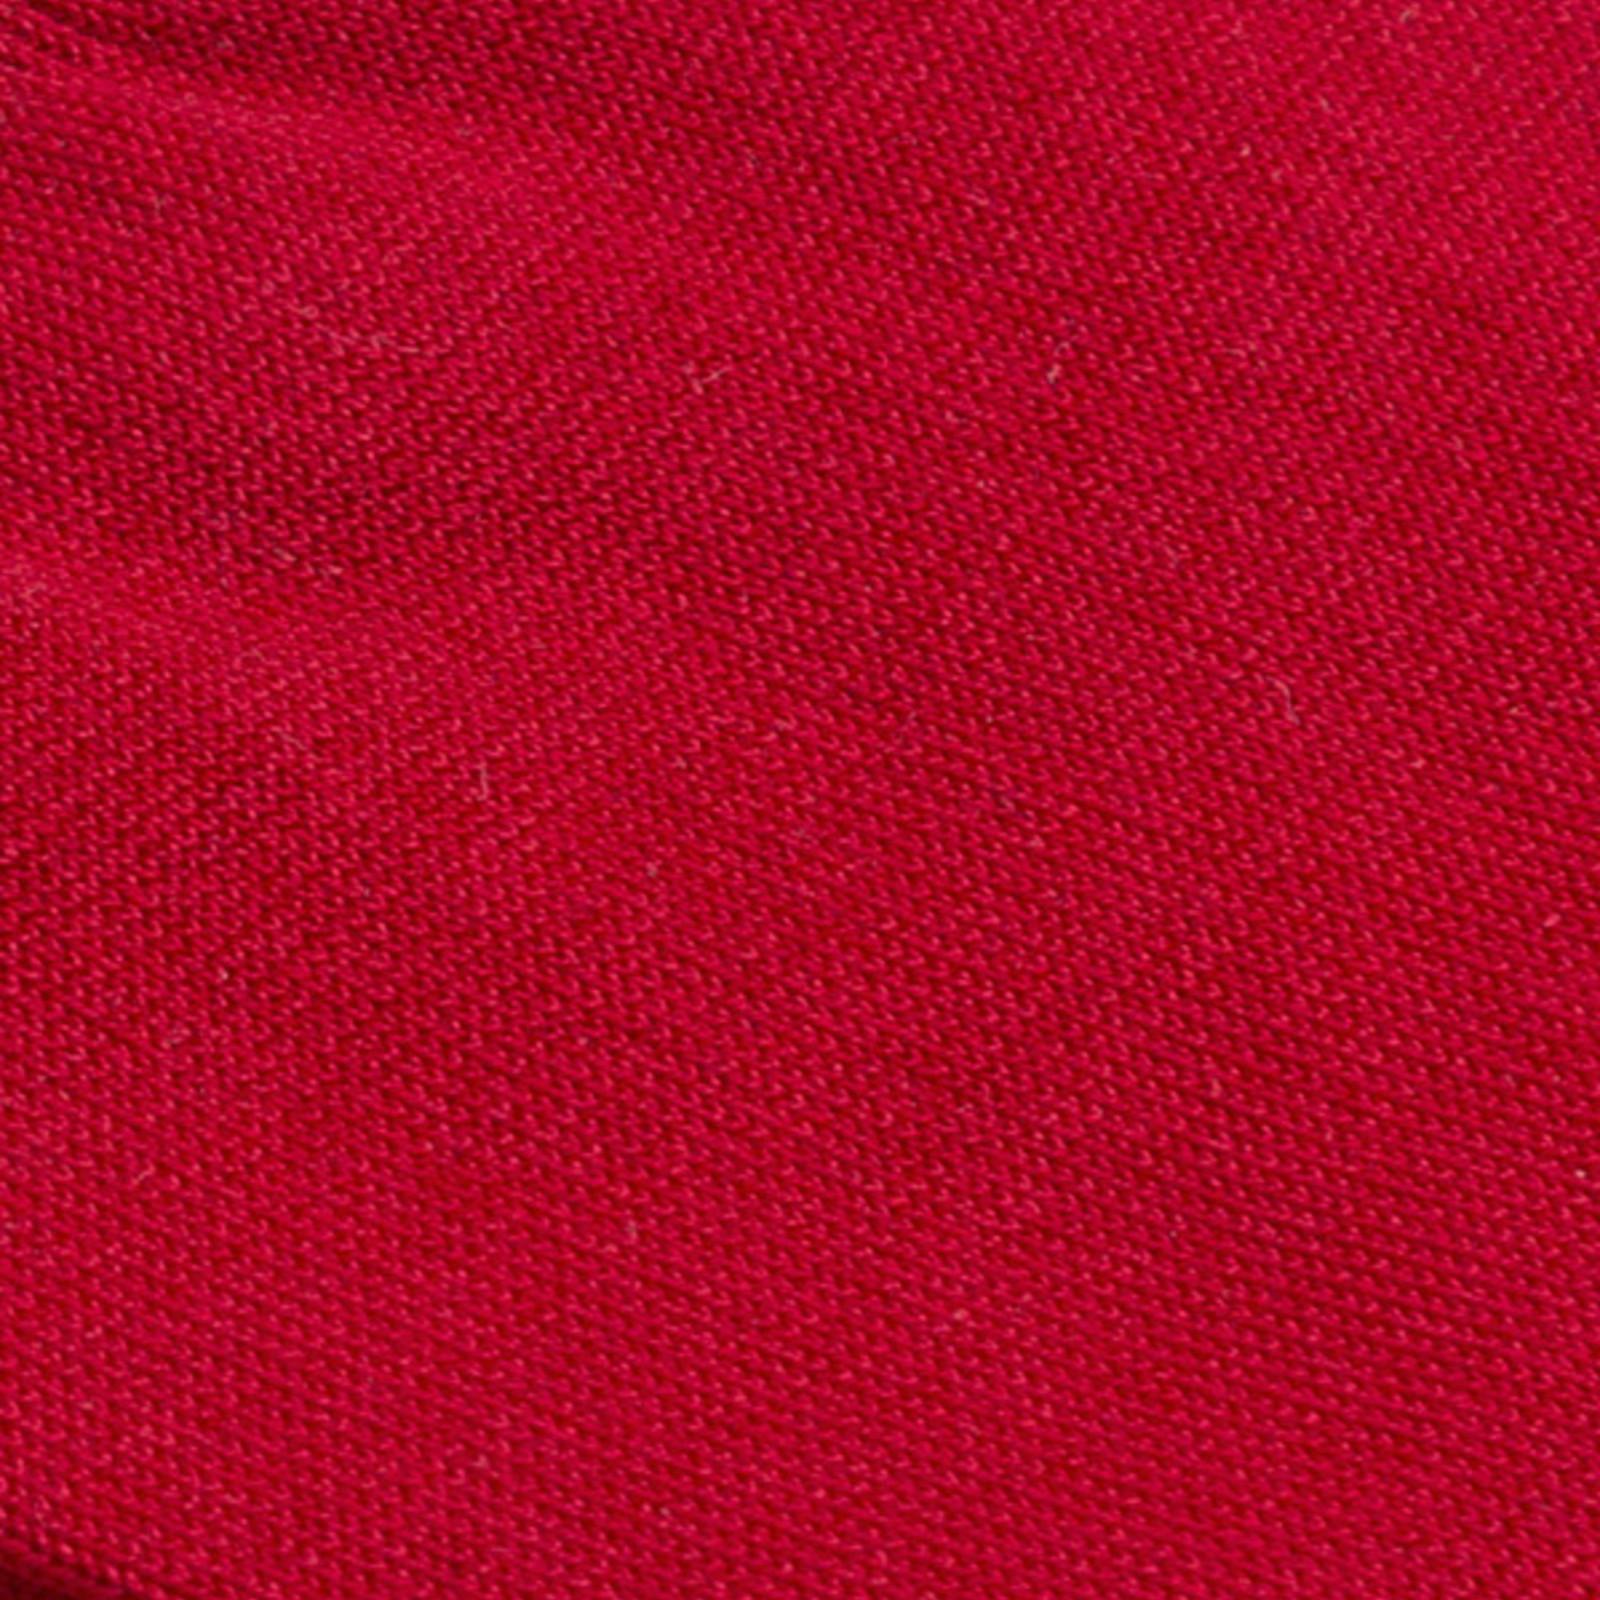 Carlo Lanza Rode katoenen sokken | Carlo Lanza